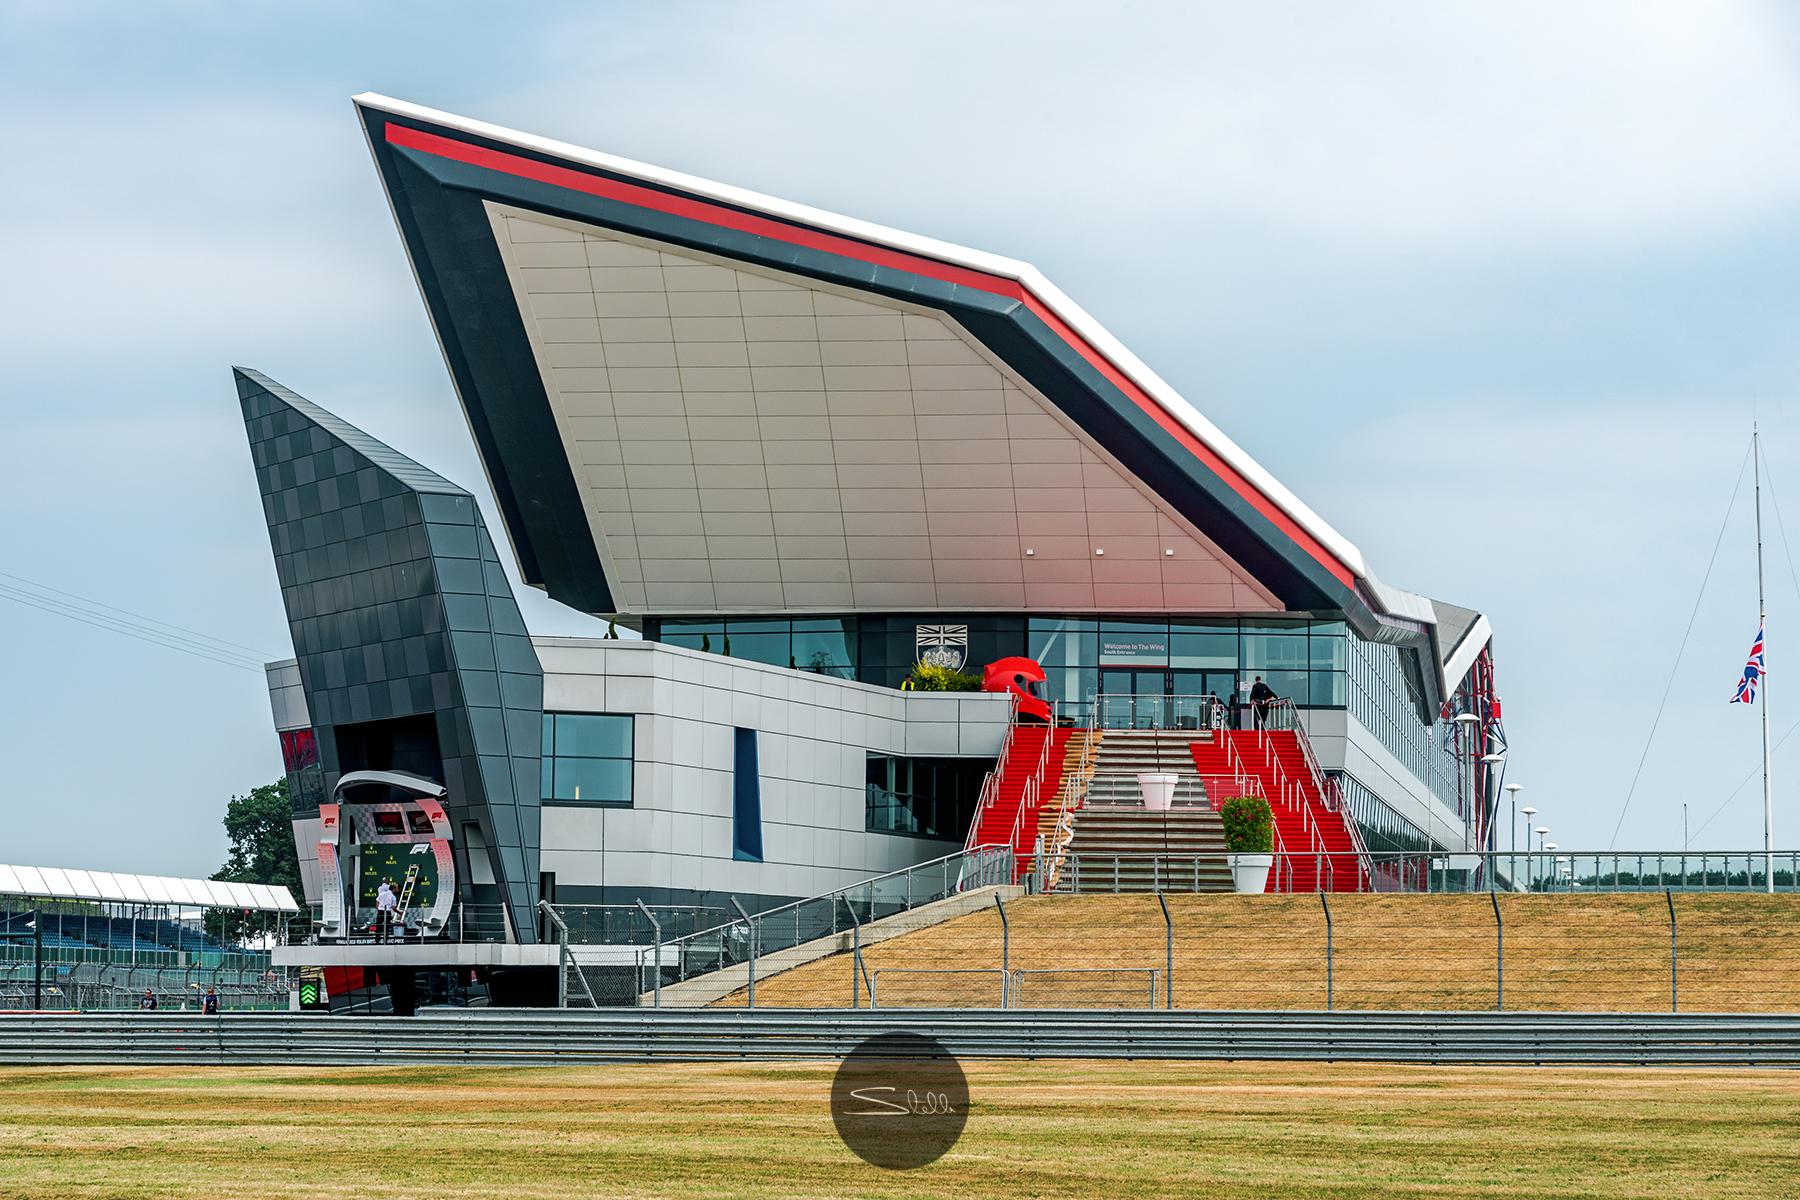 Stella Scordellis British Grand Prix 2018 9 Watermarked.jpg